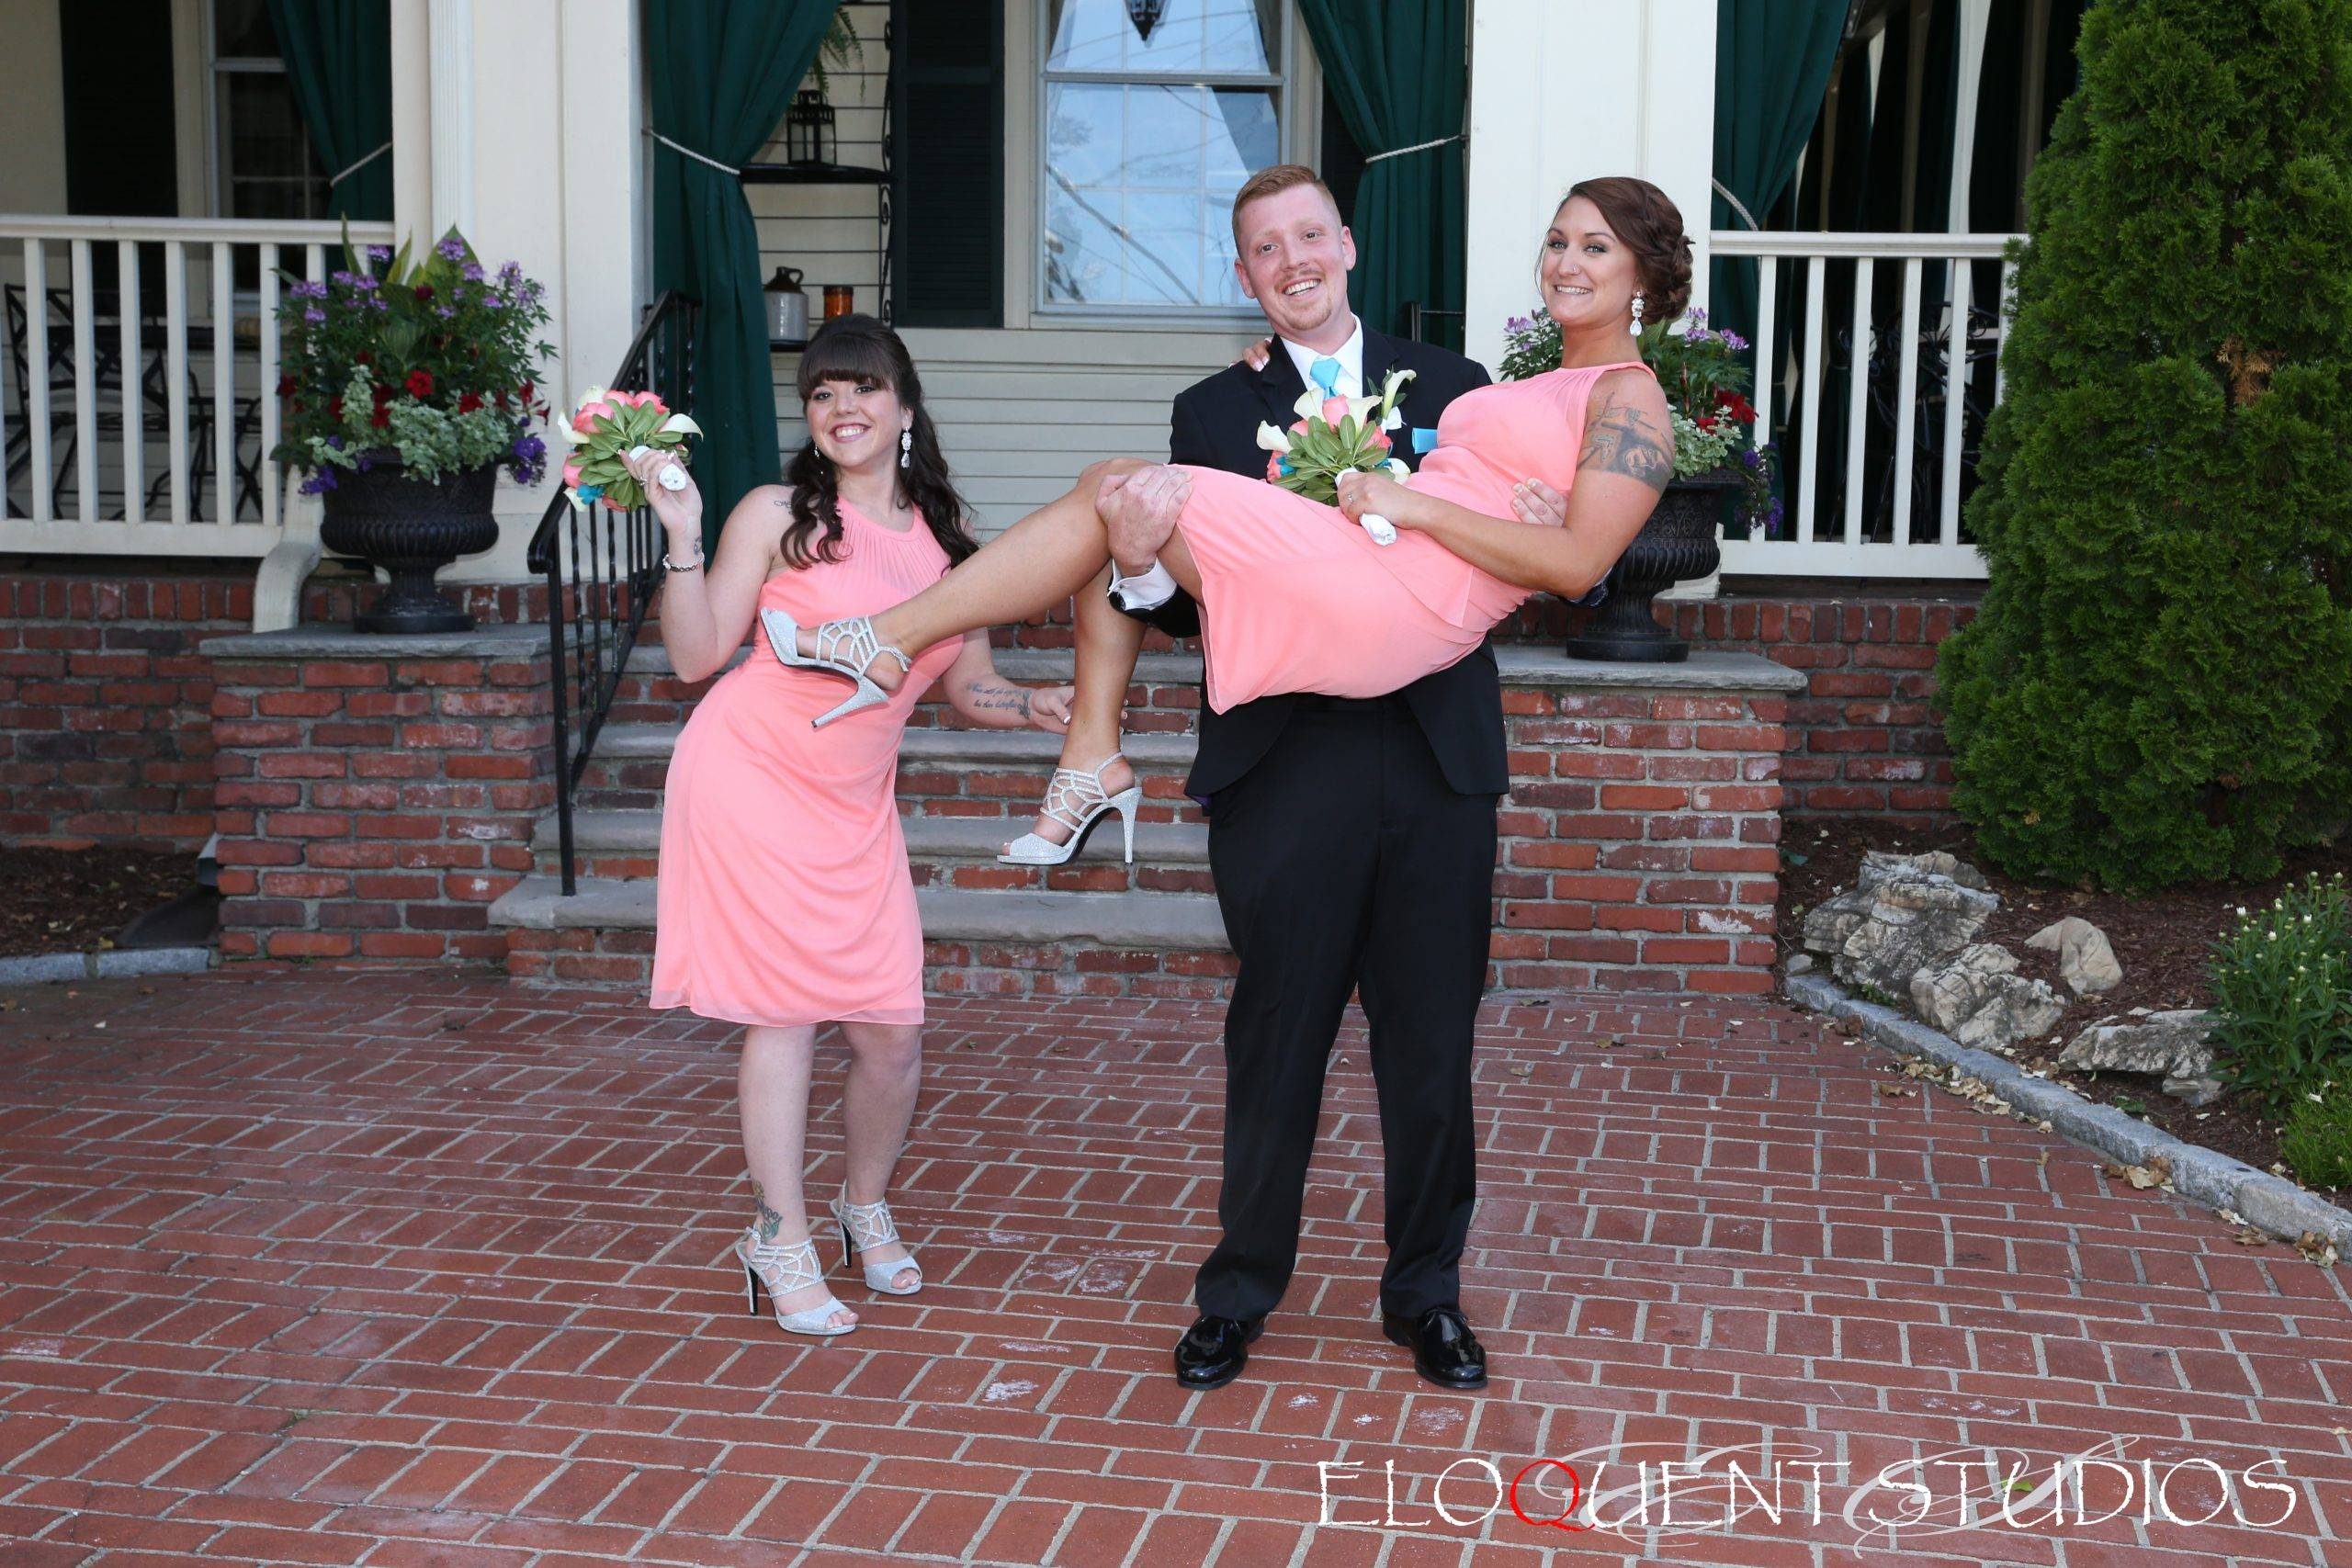 David's Country Inn groom and bridesmaids